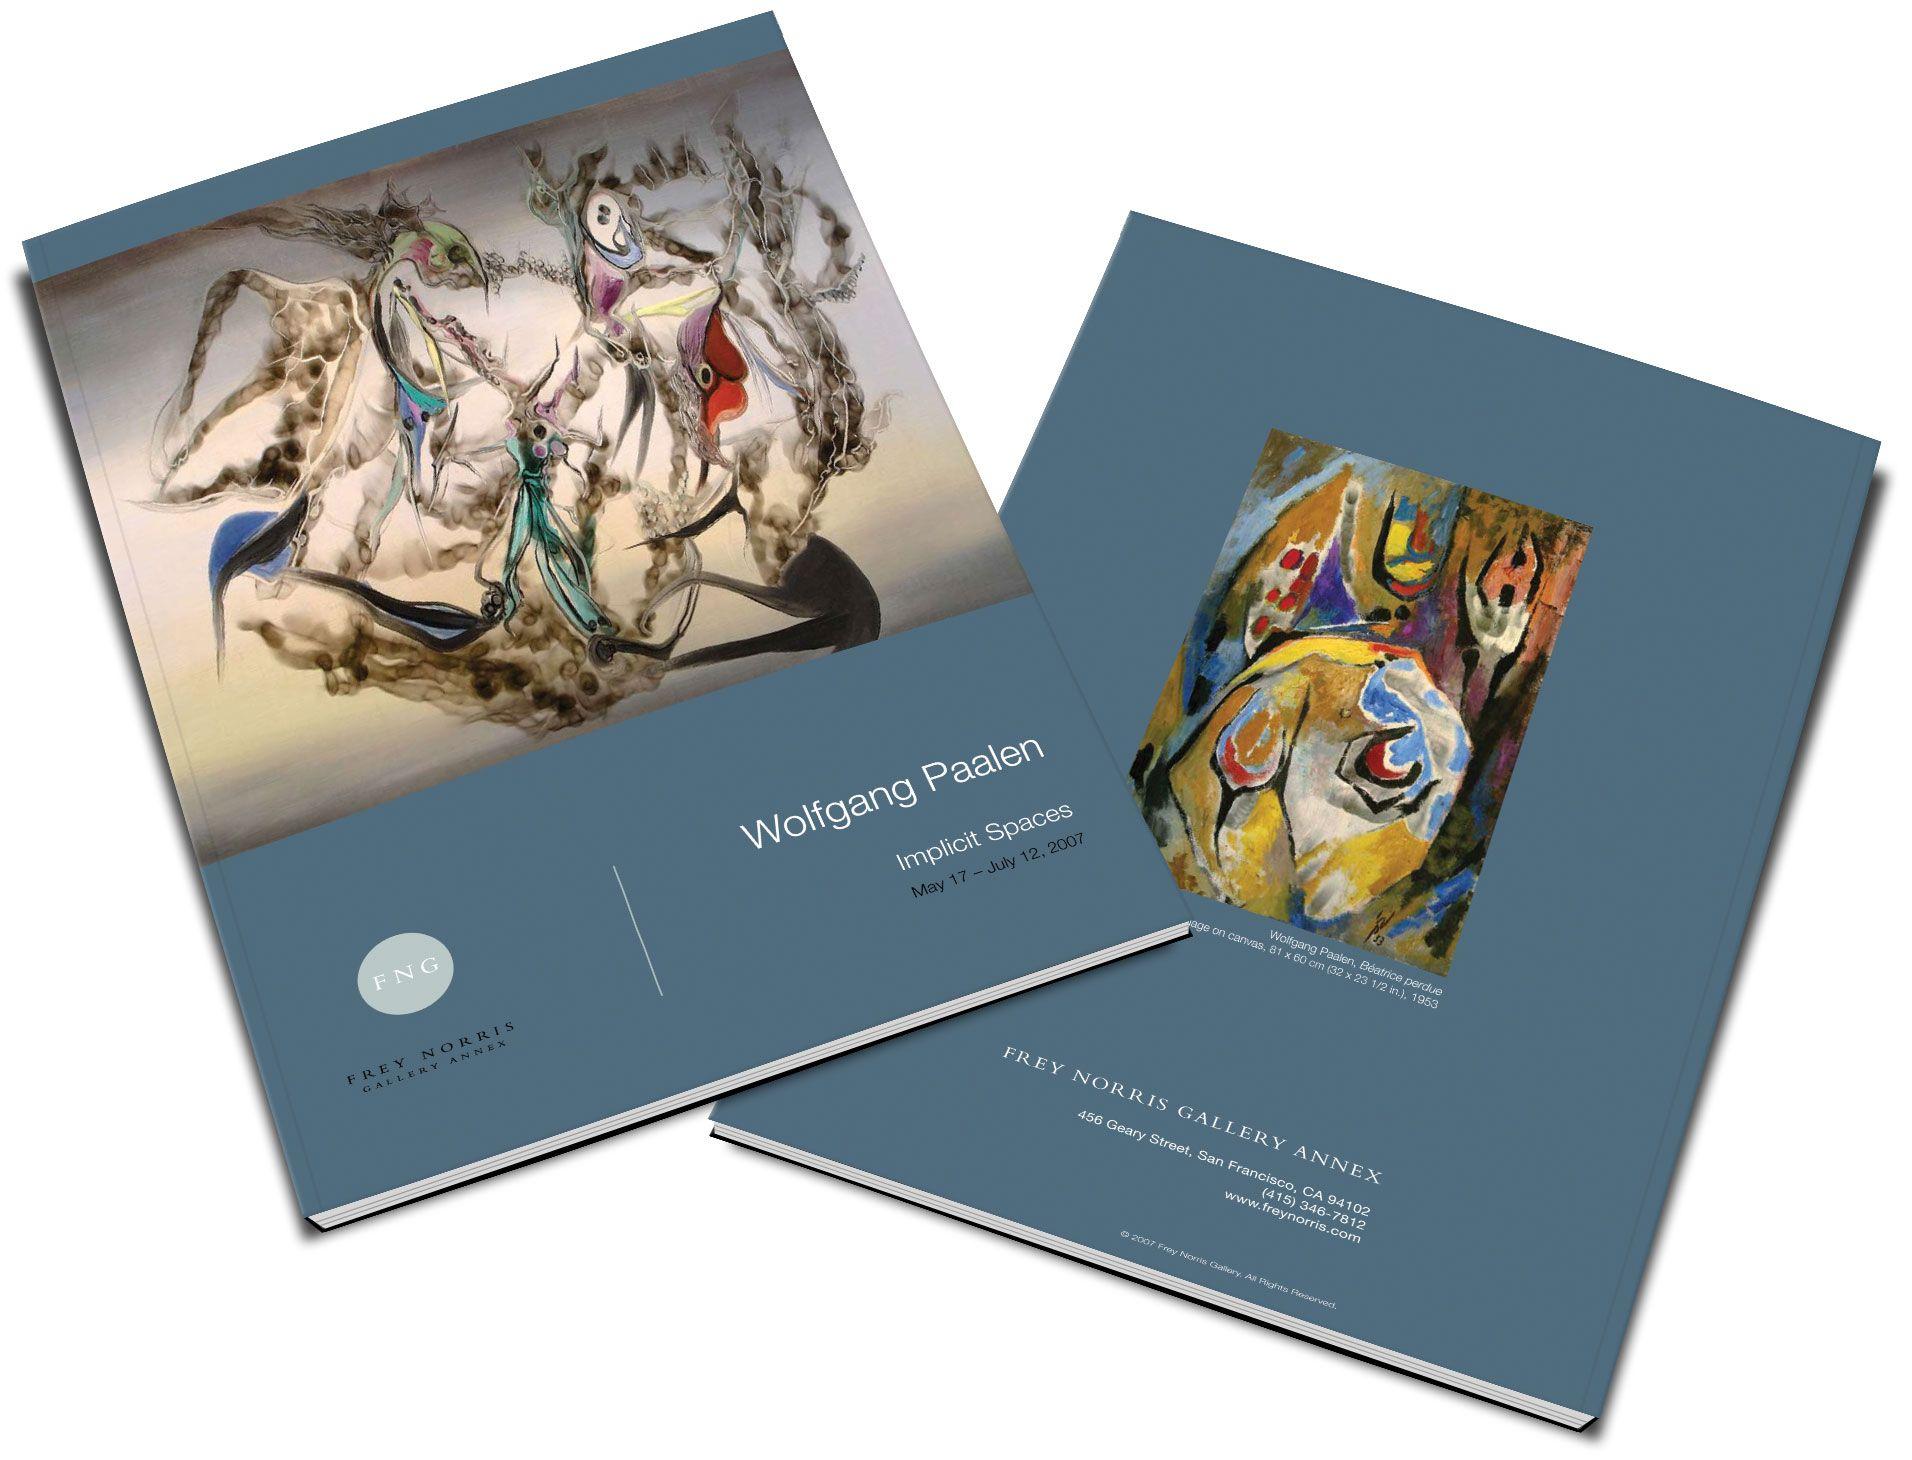 Exhibition Catalog Design  Wolfgang Paalen Exhibition Catalog